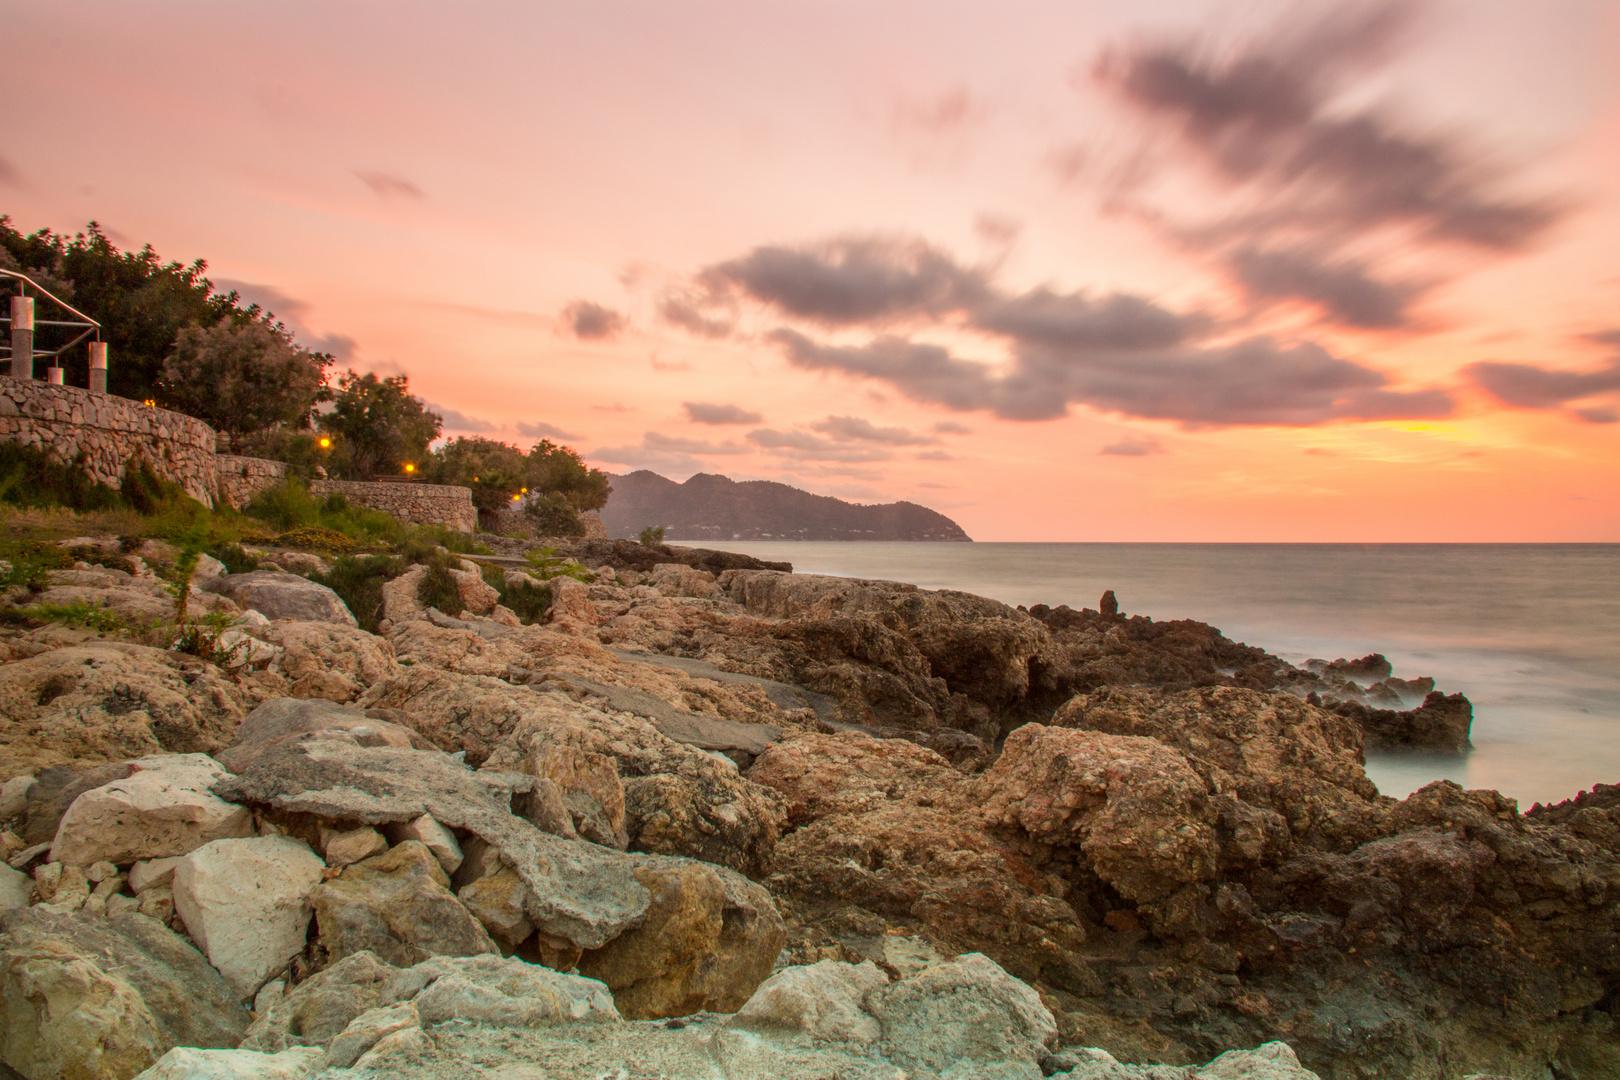 Sonnenaufgang Cala Millor Mallorca Mittelmeer